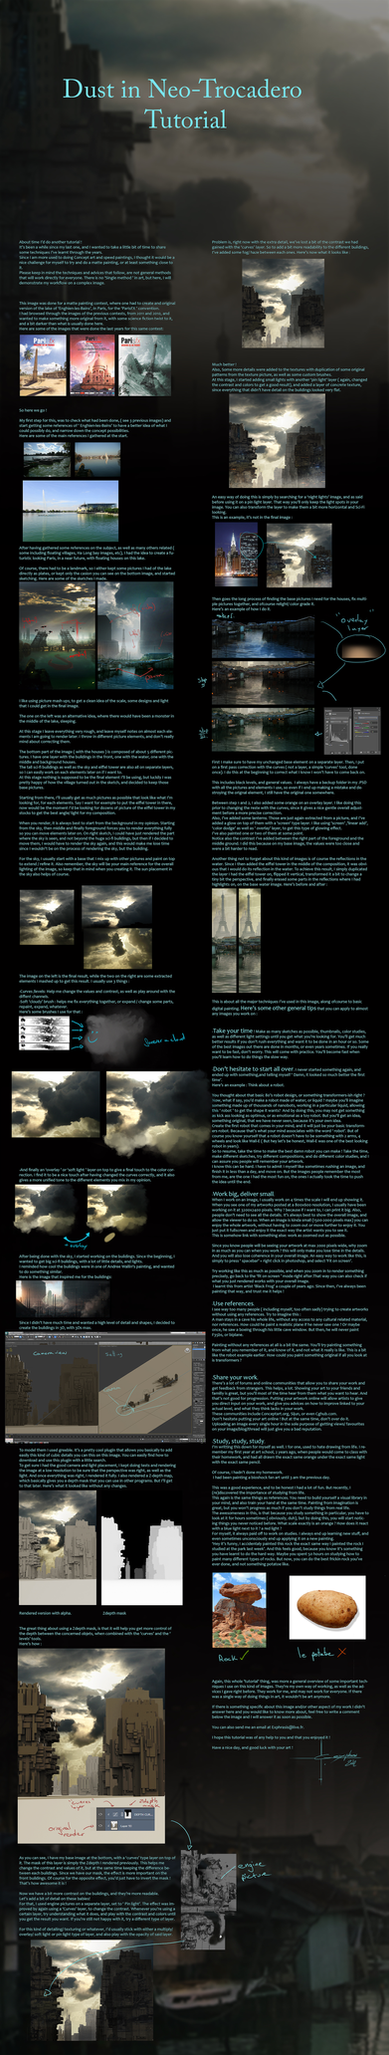 Tutorial- Dust in Neo-Trocadero by Exphrasis